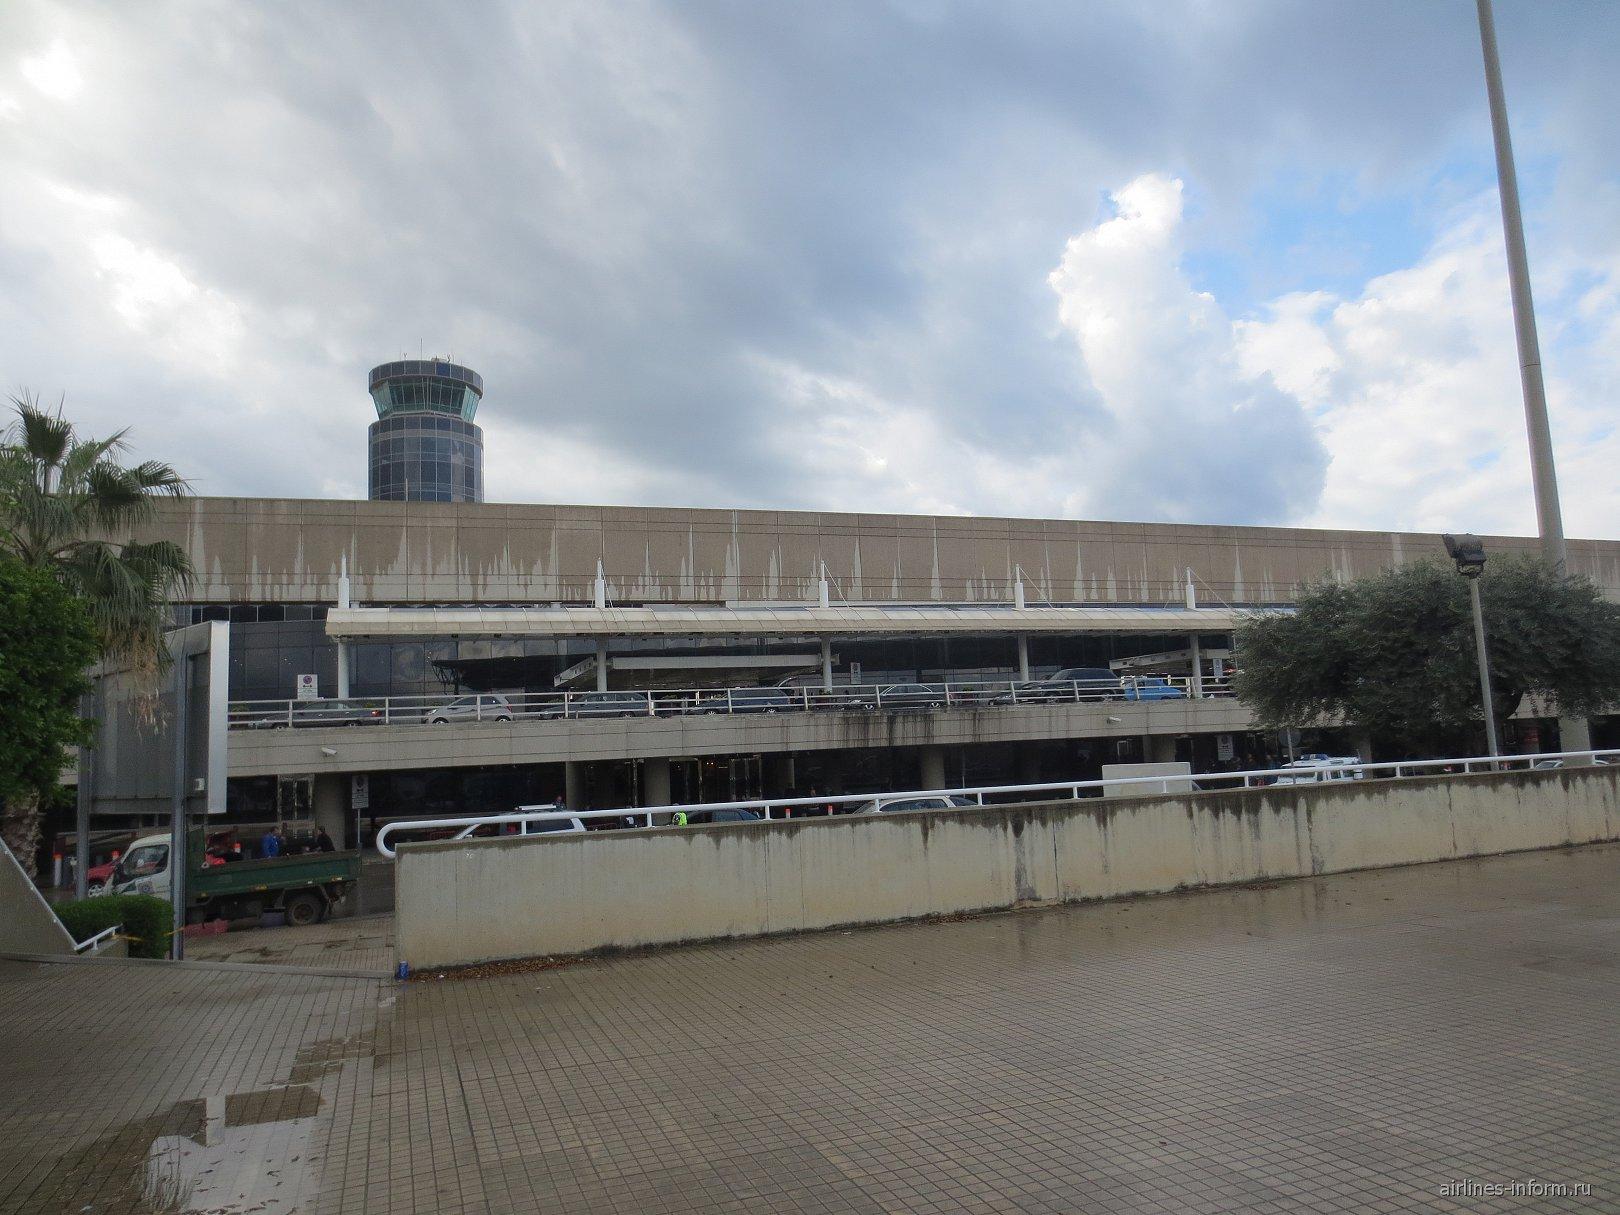 Аэровокзал аэропорта Бейрут Рафик Харири